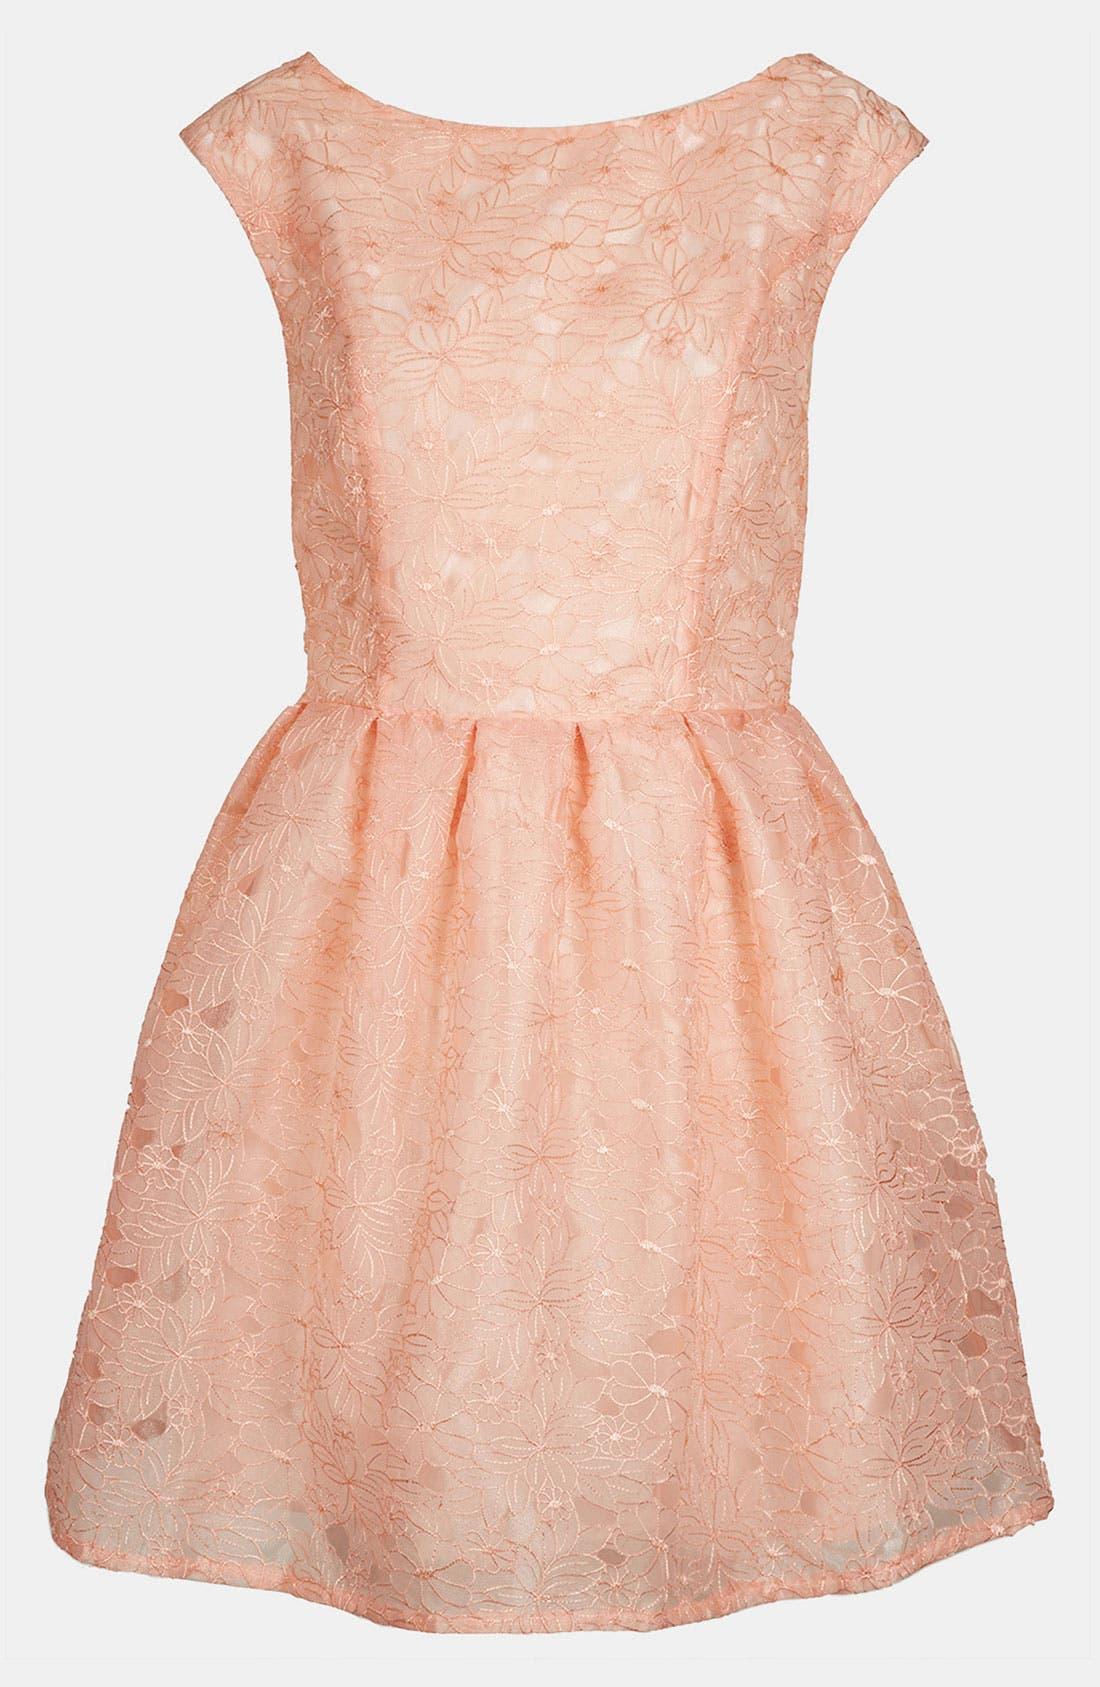 Main Image - Topshop Floral Organza Party Dress